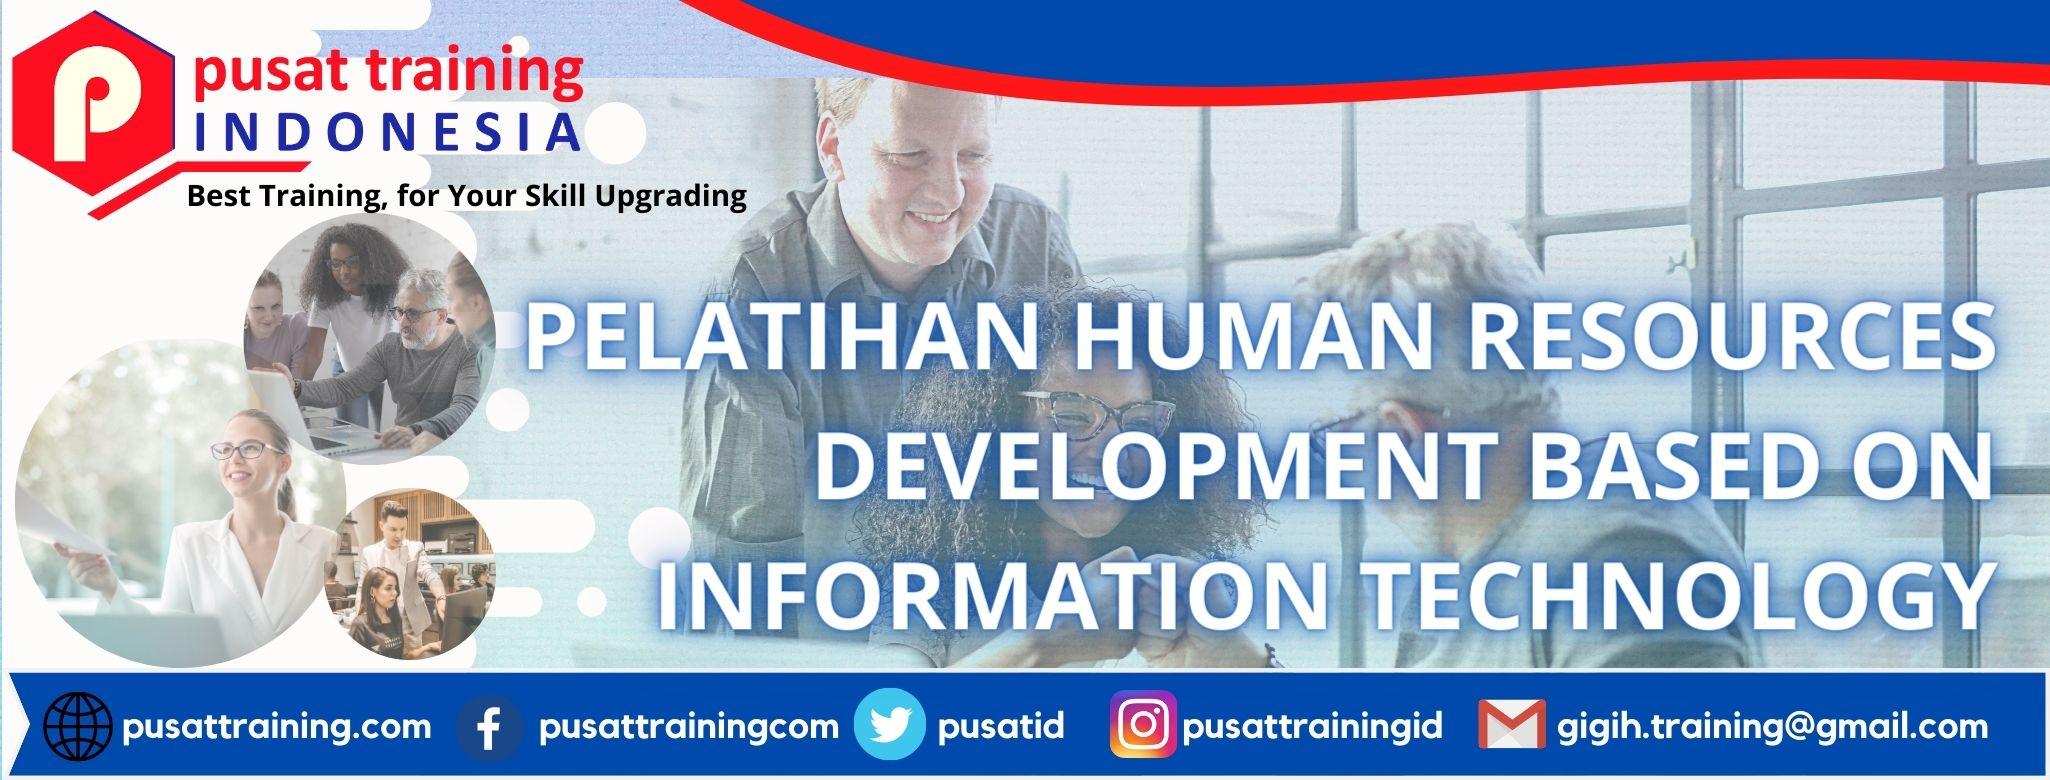 pelatihan-human-resources-development-based-on-information-technology